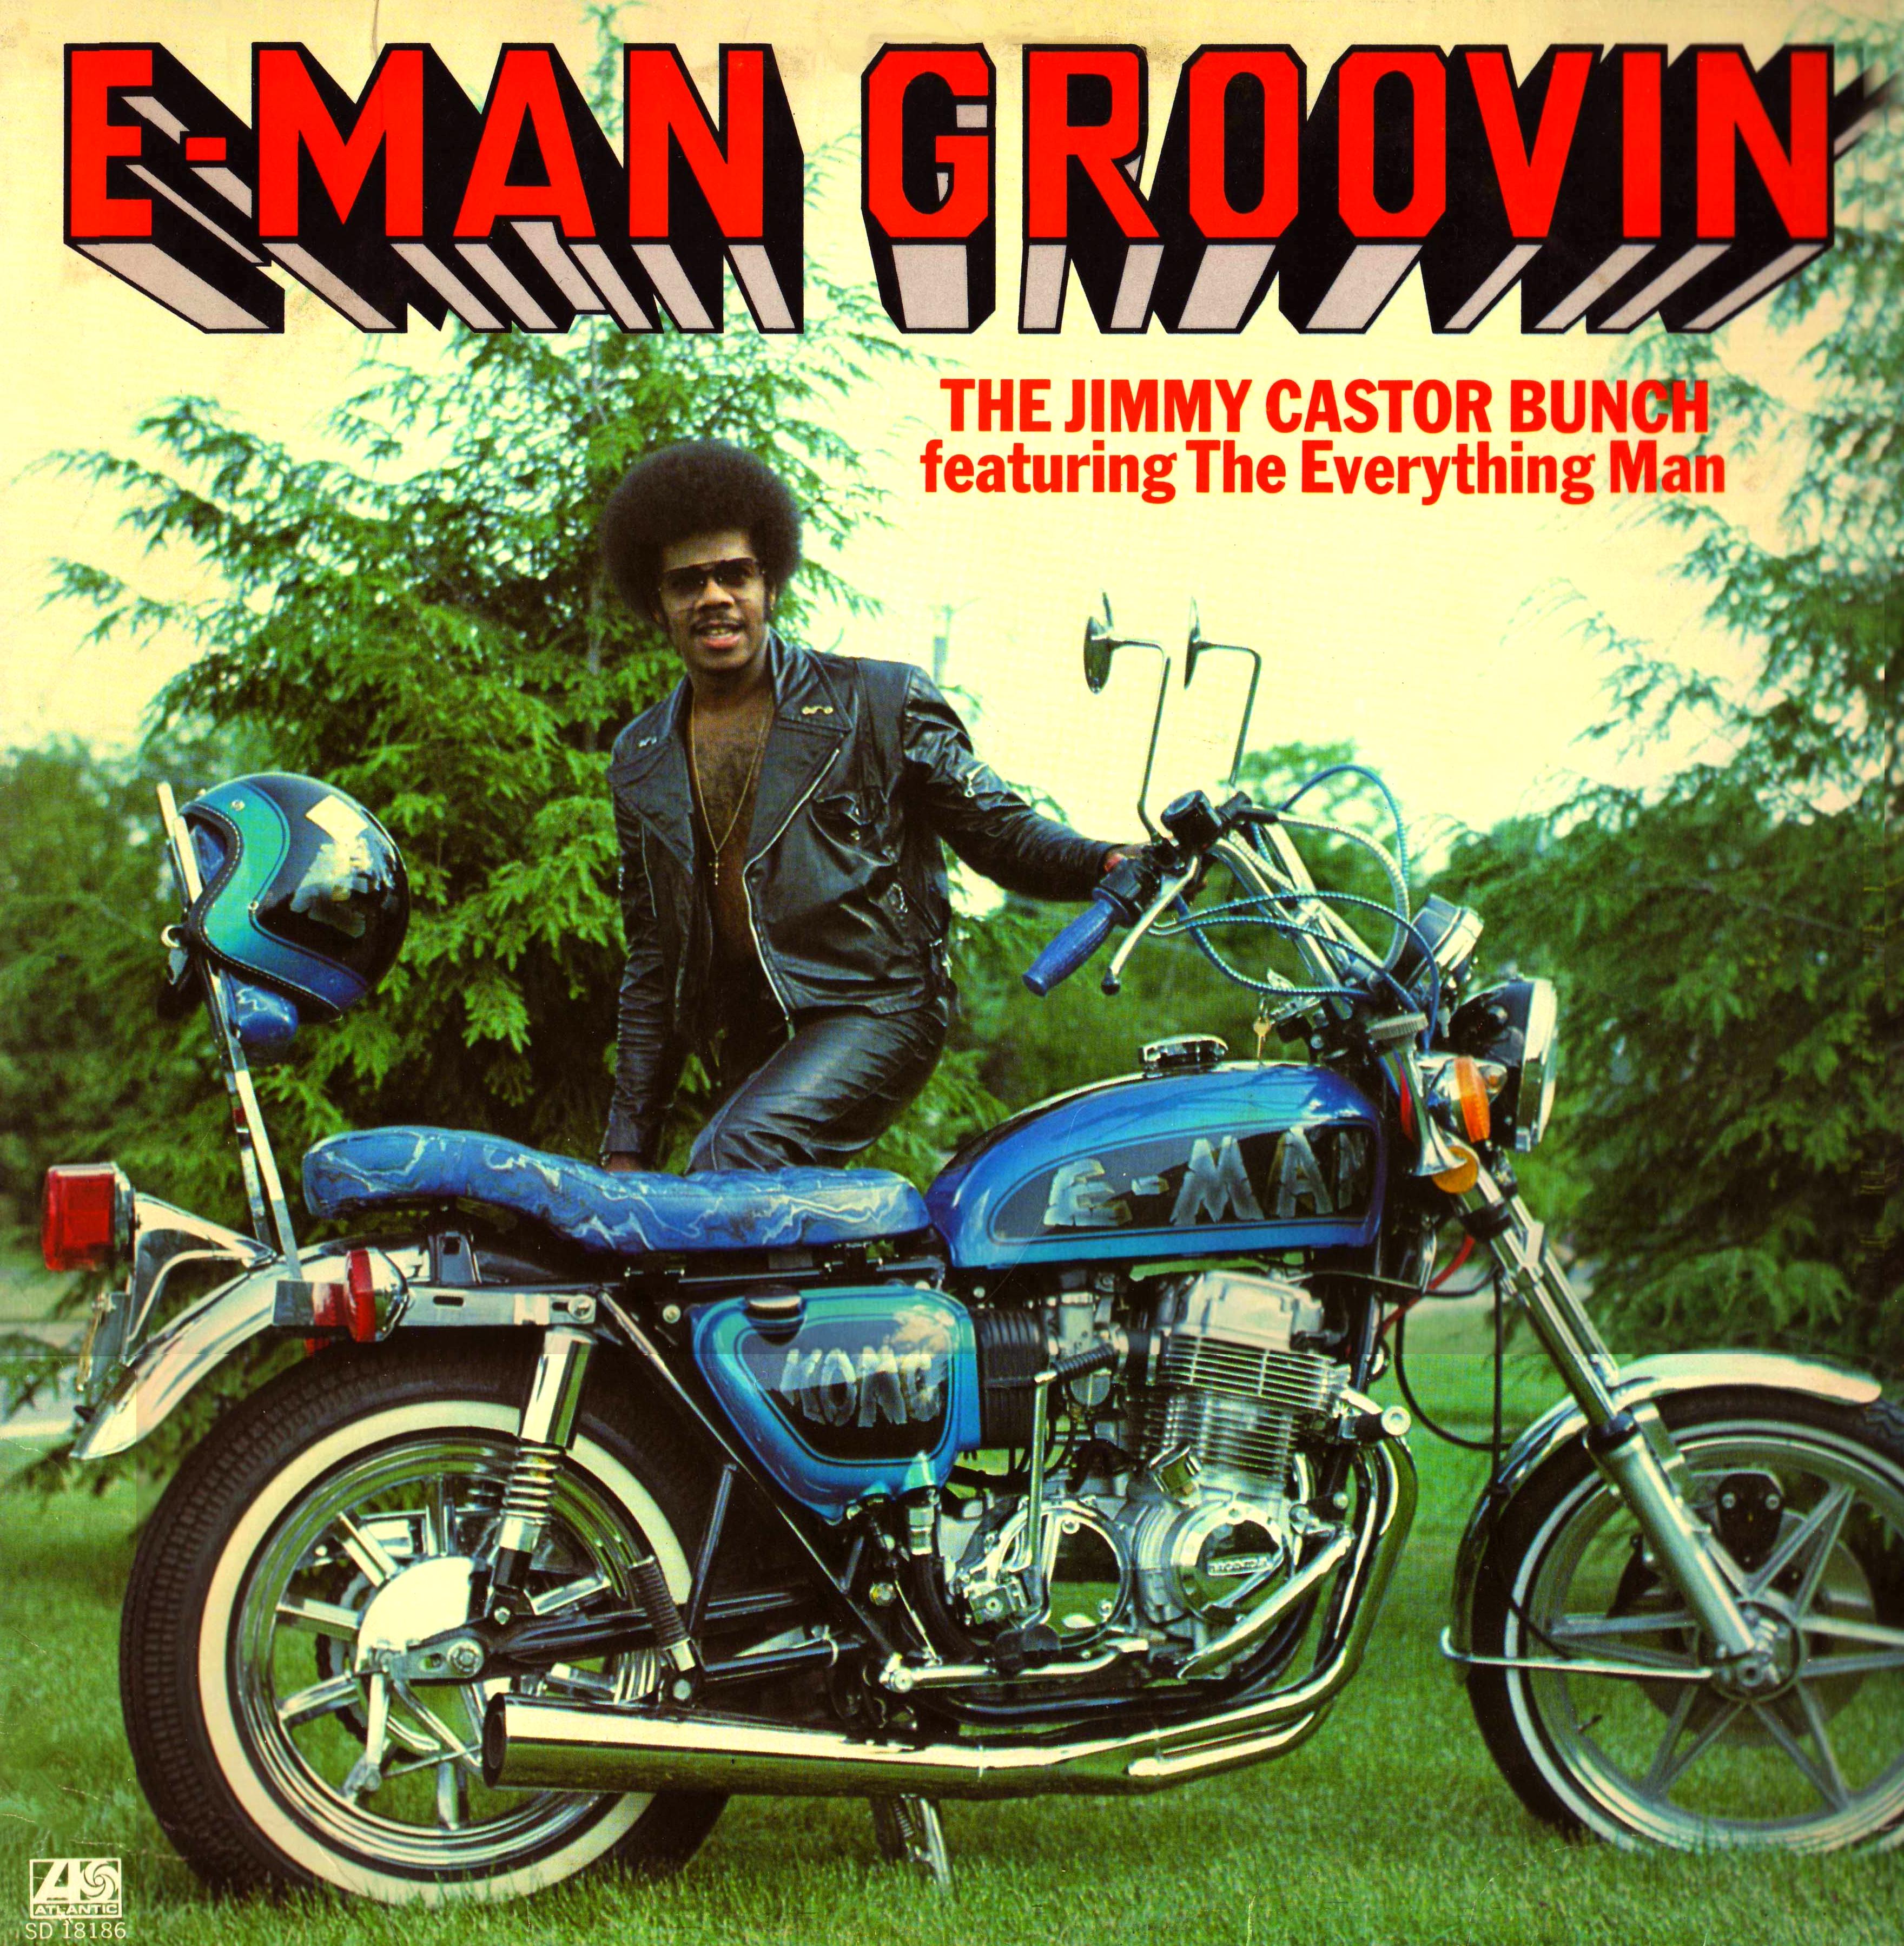 E-MAN GROOVIN' 1976